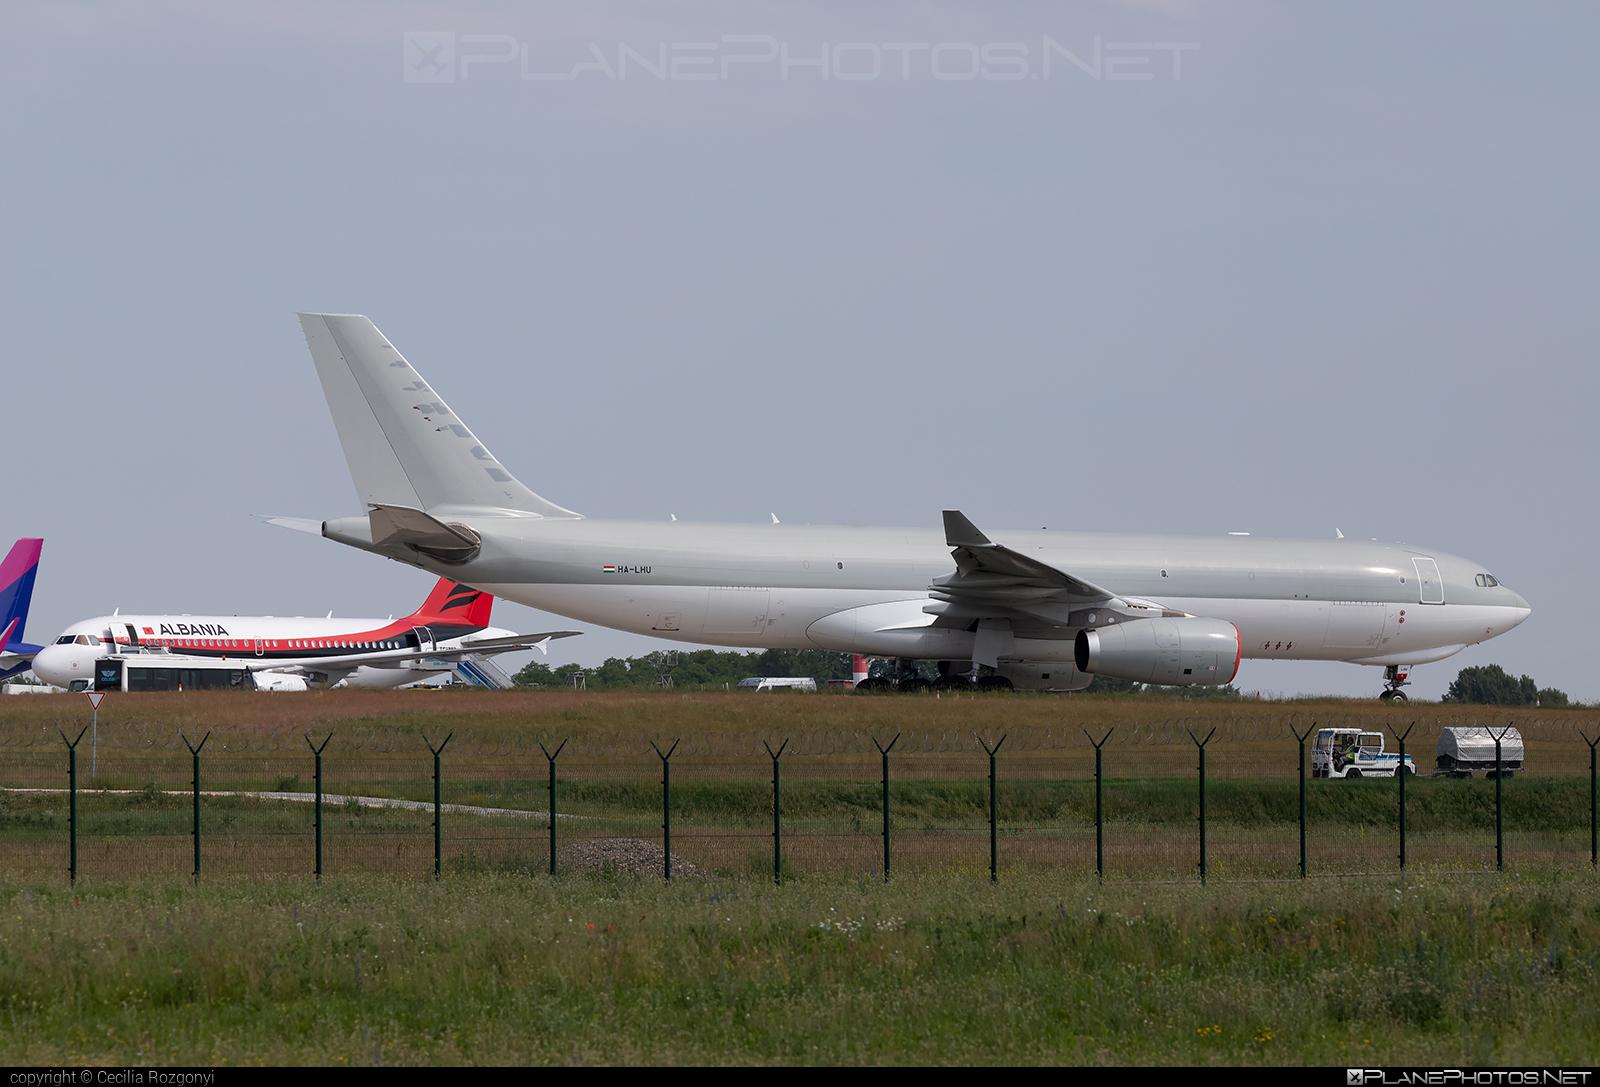 Airbus A330-243F - HA-LHU operated by Wizz Air #a330 #a330f #a330family #airbus #airbus330 #wizz #wizzair